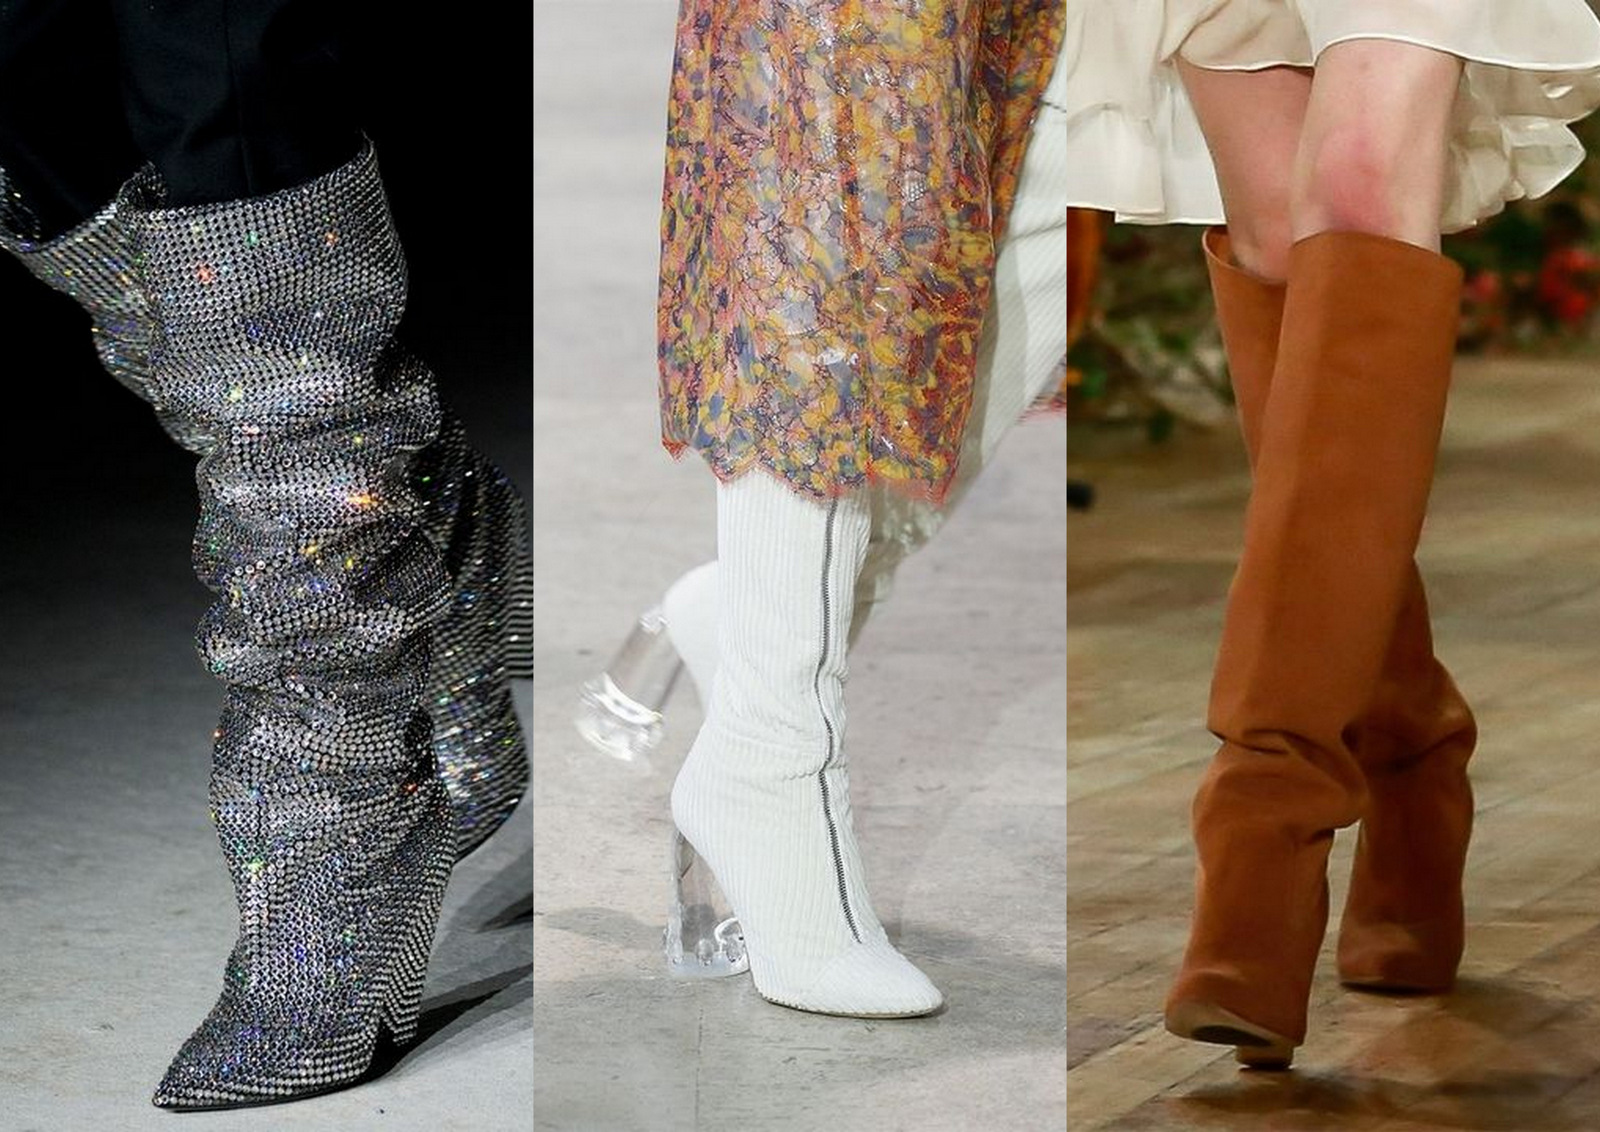 trendy topánky na obdobie jeseň-zima // shoes fashion trend autumn/winter 2017/18